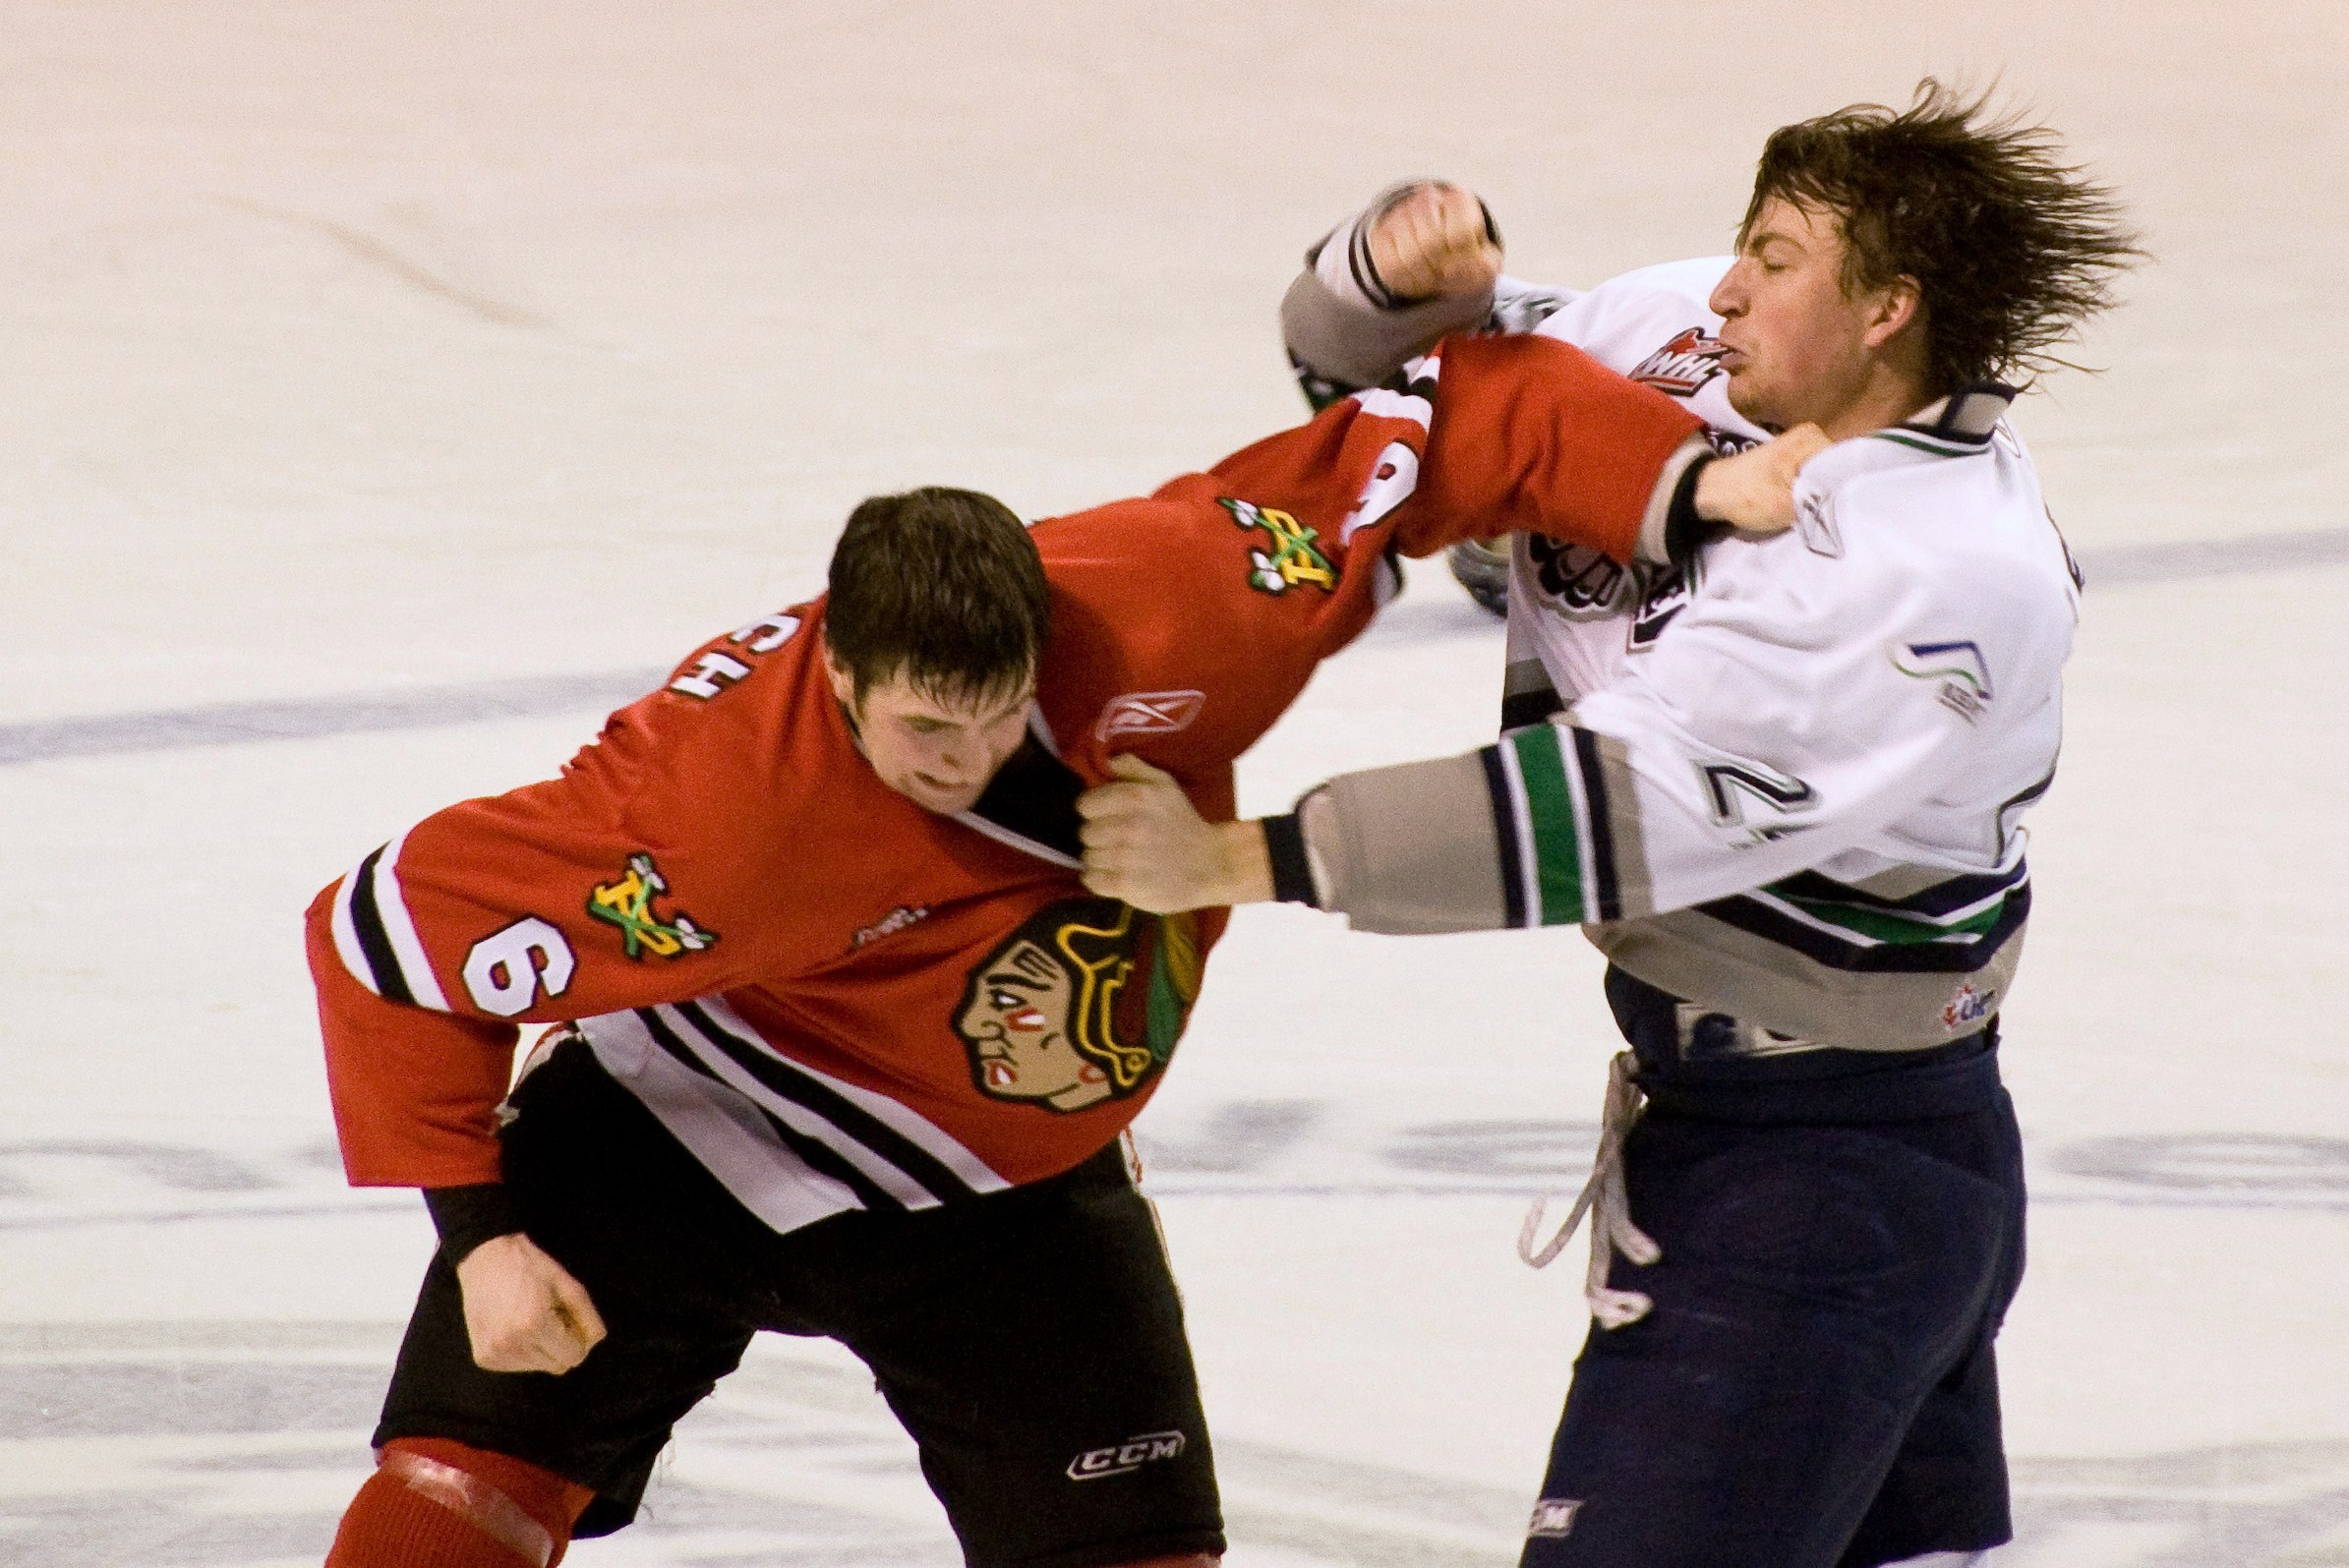 File:Fight in ice hockey 2009.JPG - Wikipedia, the free encyclopedia: en.m.wikipedia.org/wiki/File:Fight_in_ice_hockey_2009.JPG